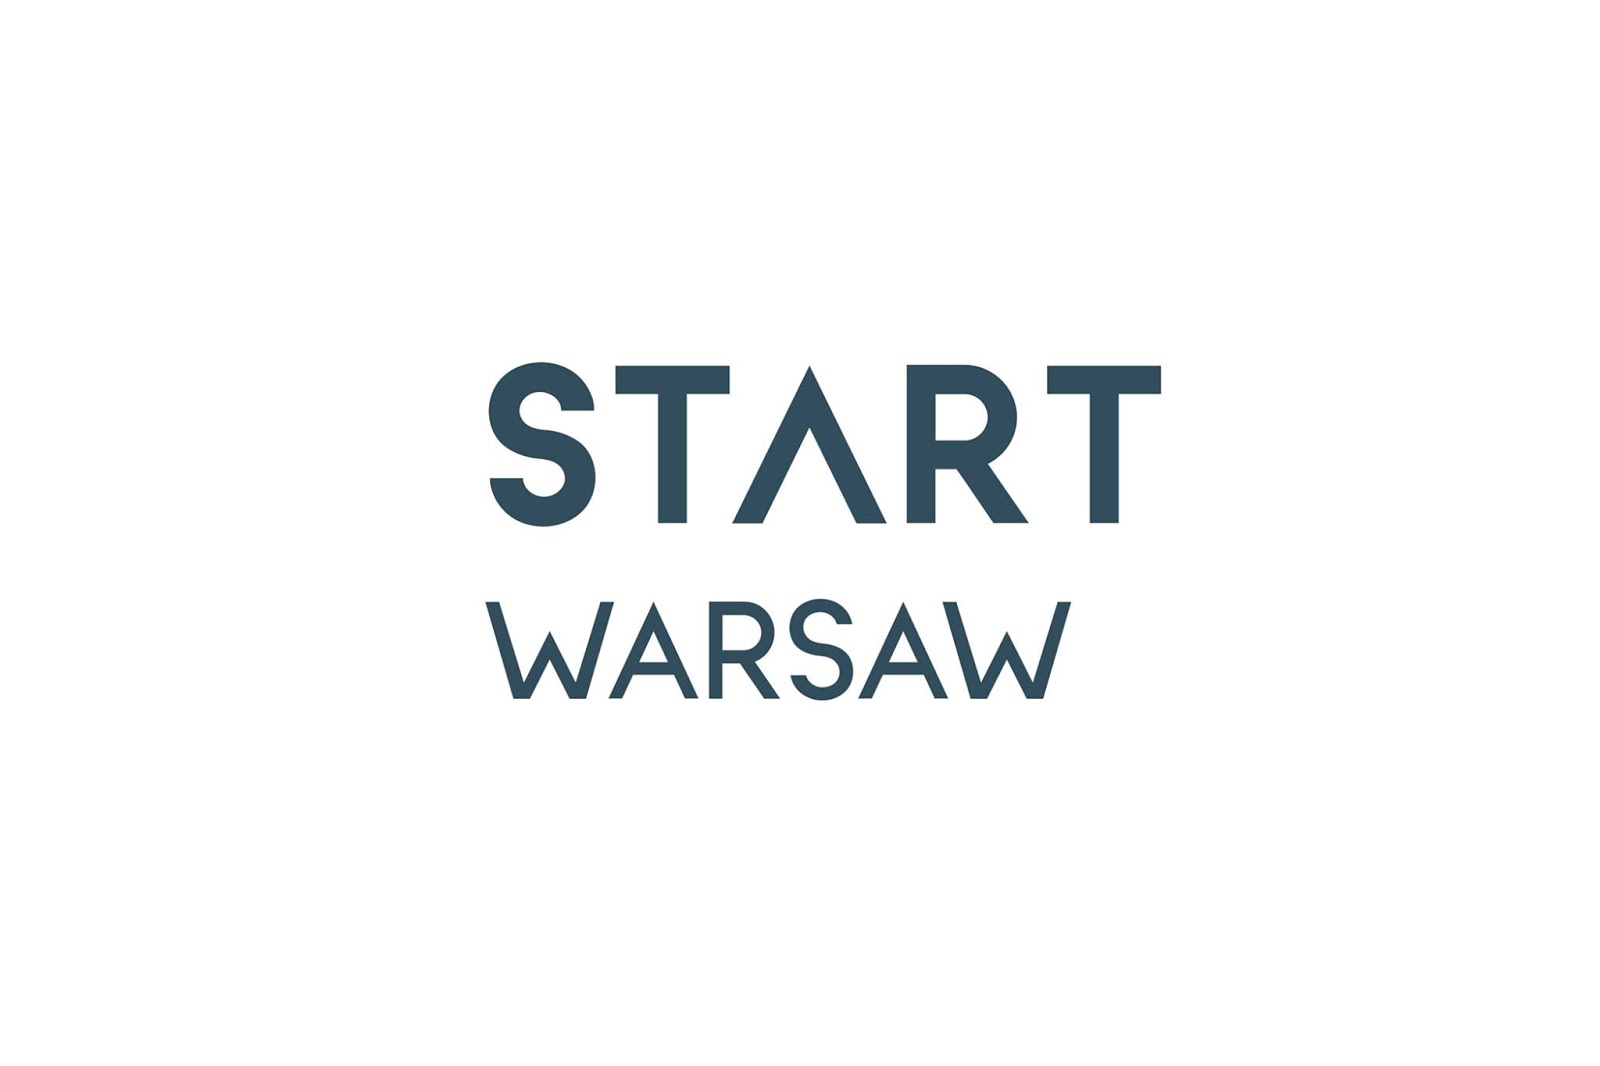 Start Warsaw History